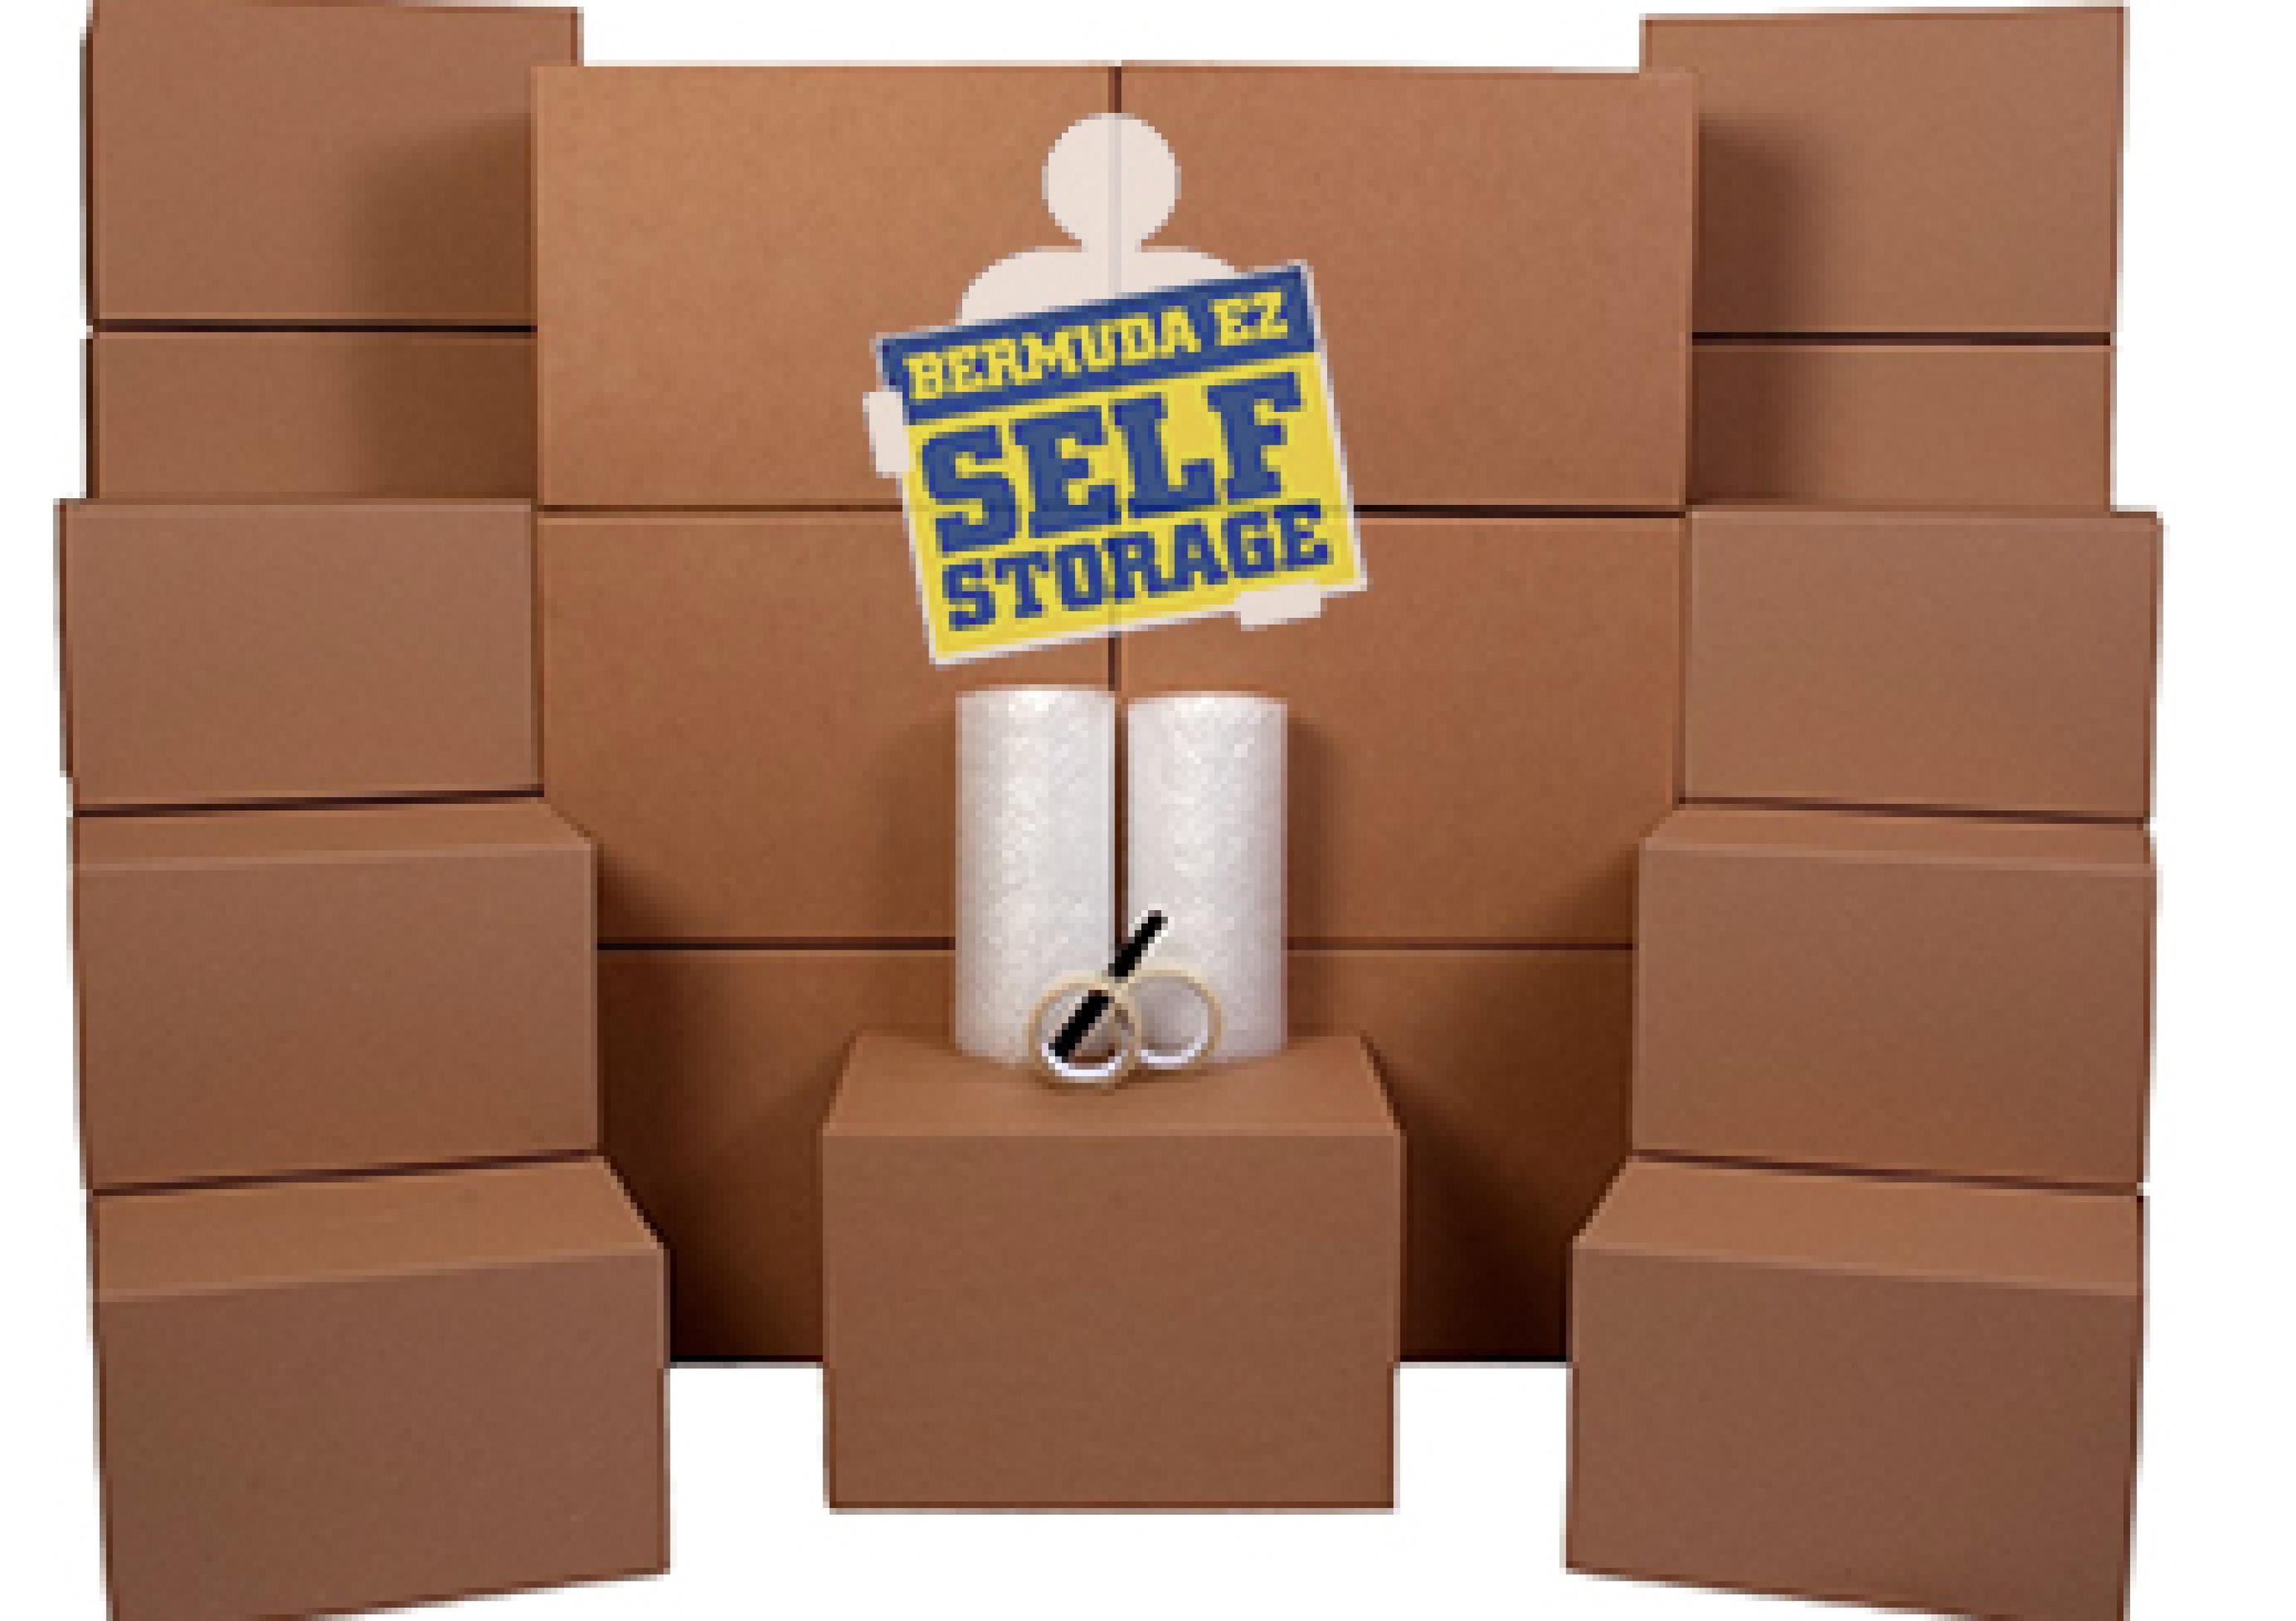 Bermuda EZ Self Storage